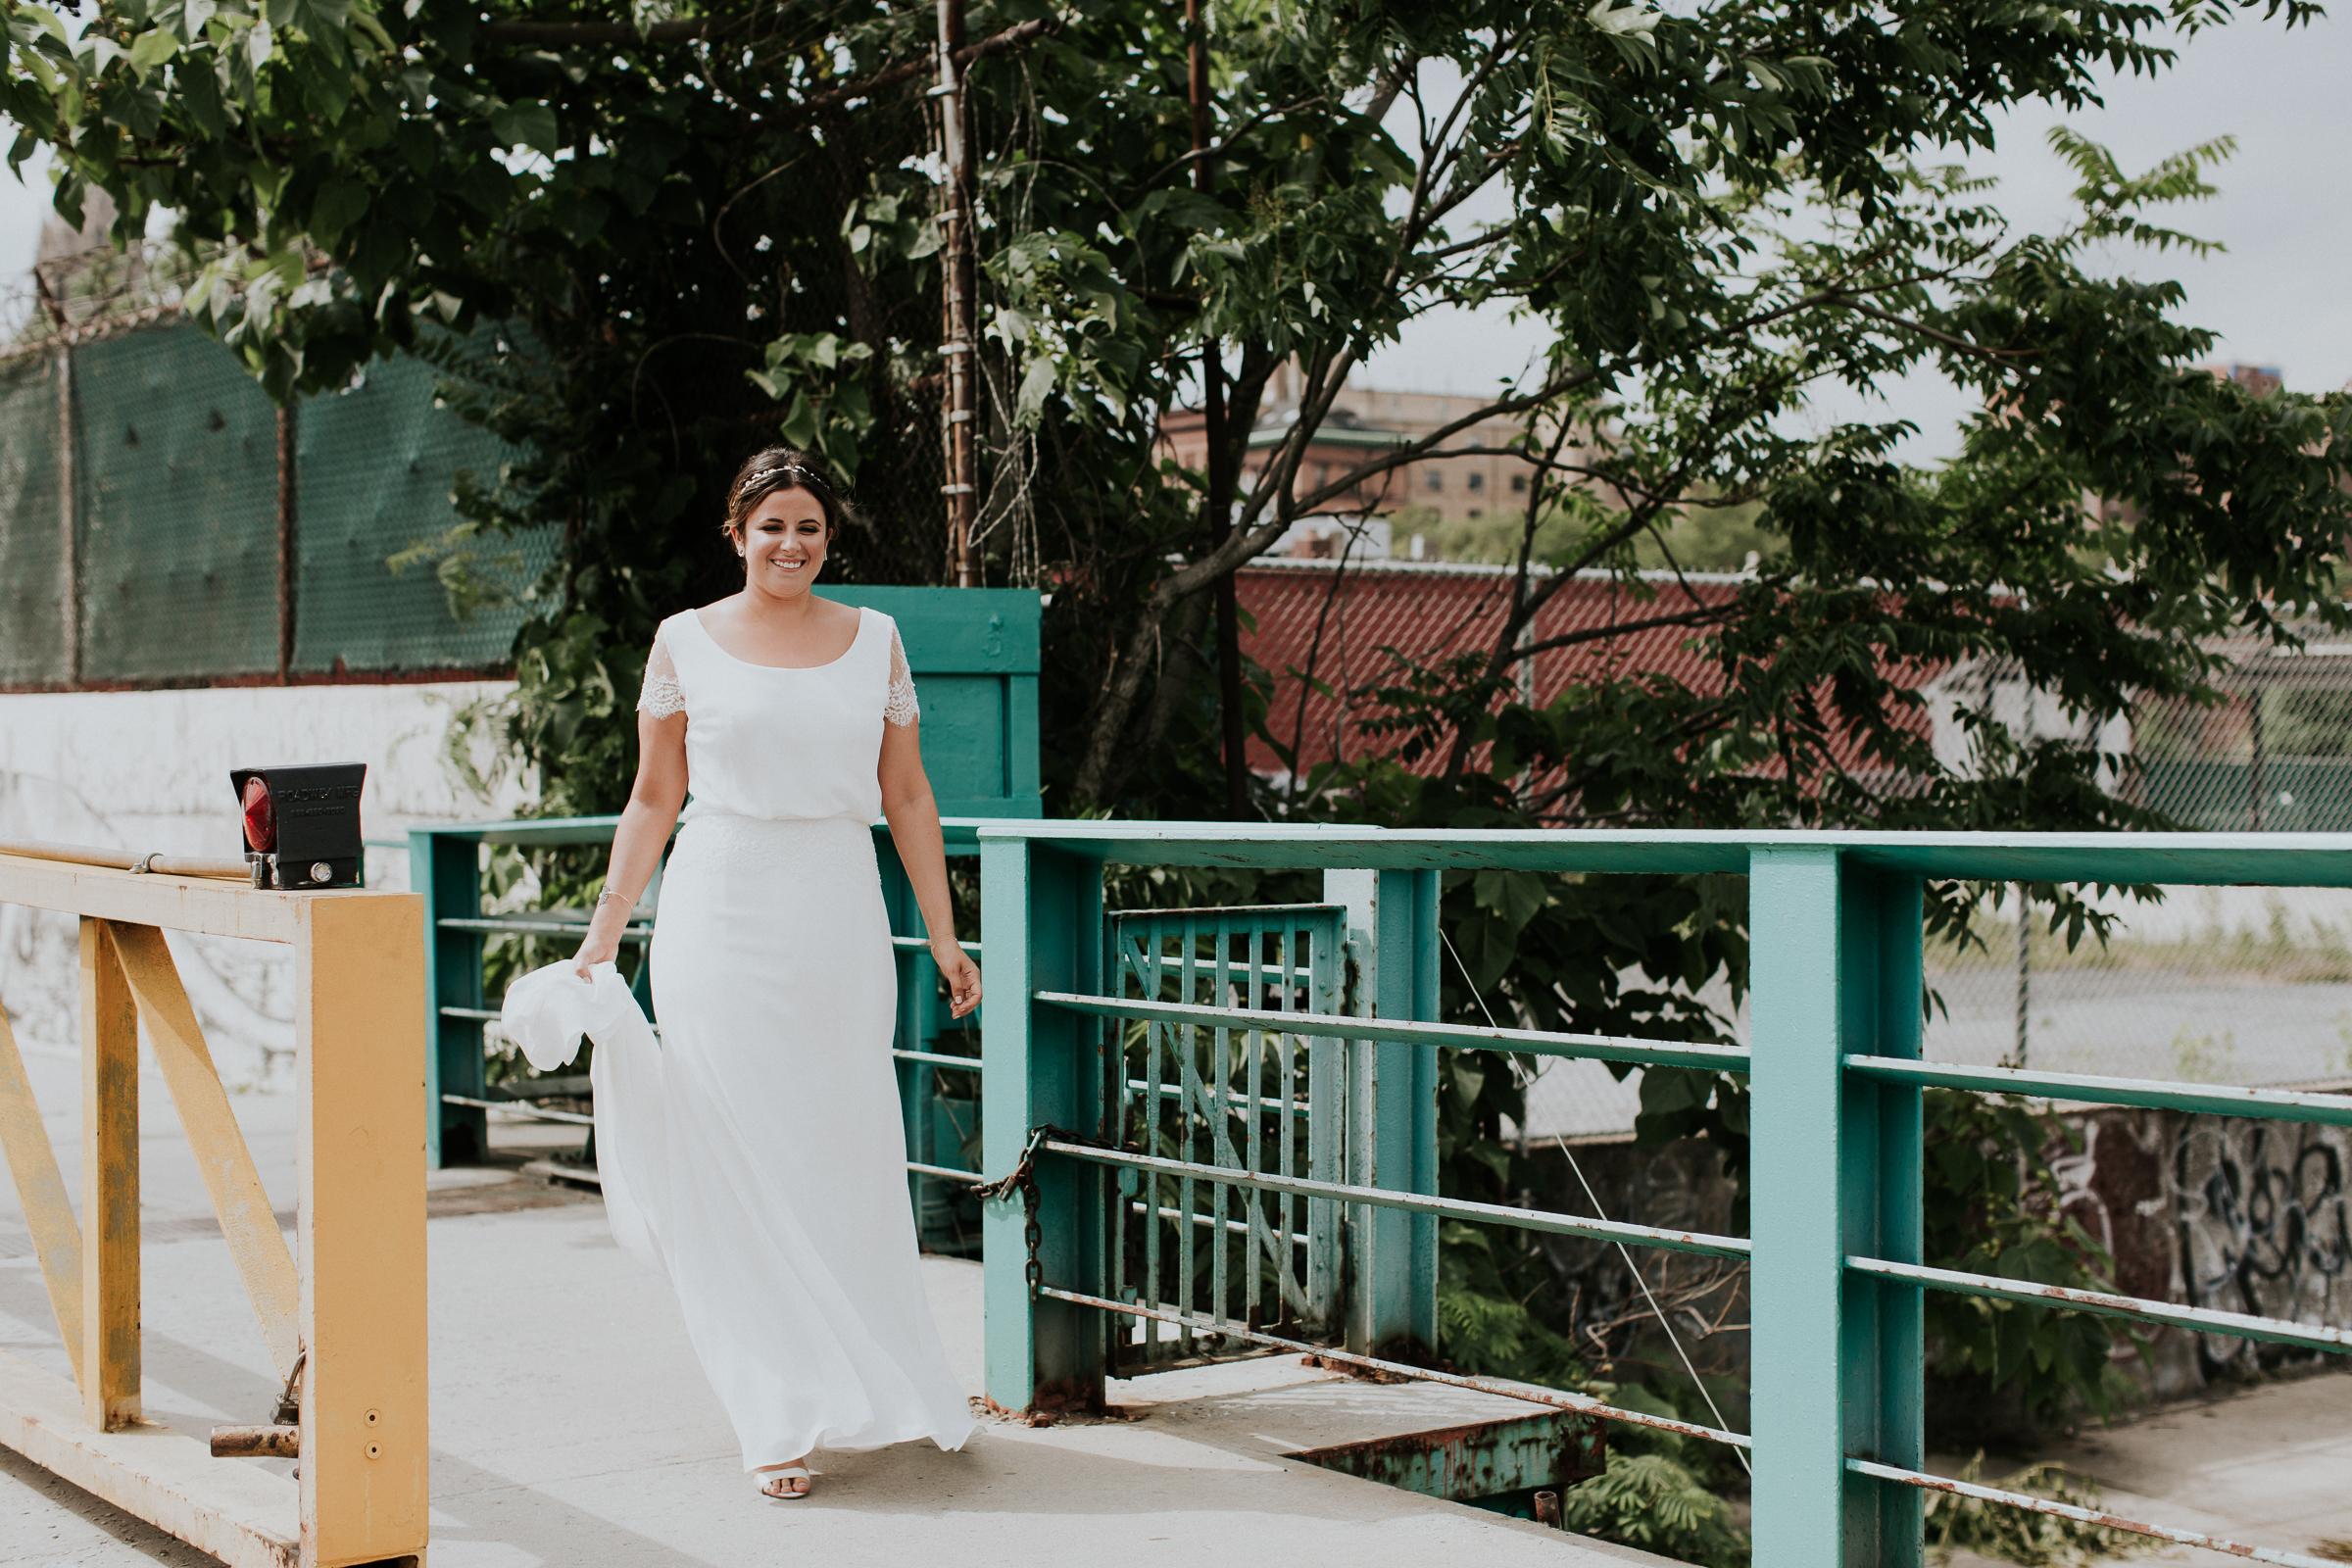 501-Union-Brooklyn-Fine-Art-Documentary-Wedding-Photographer-25.jpg